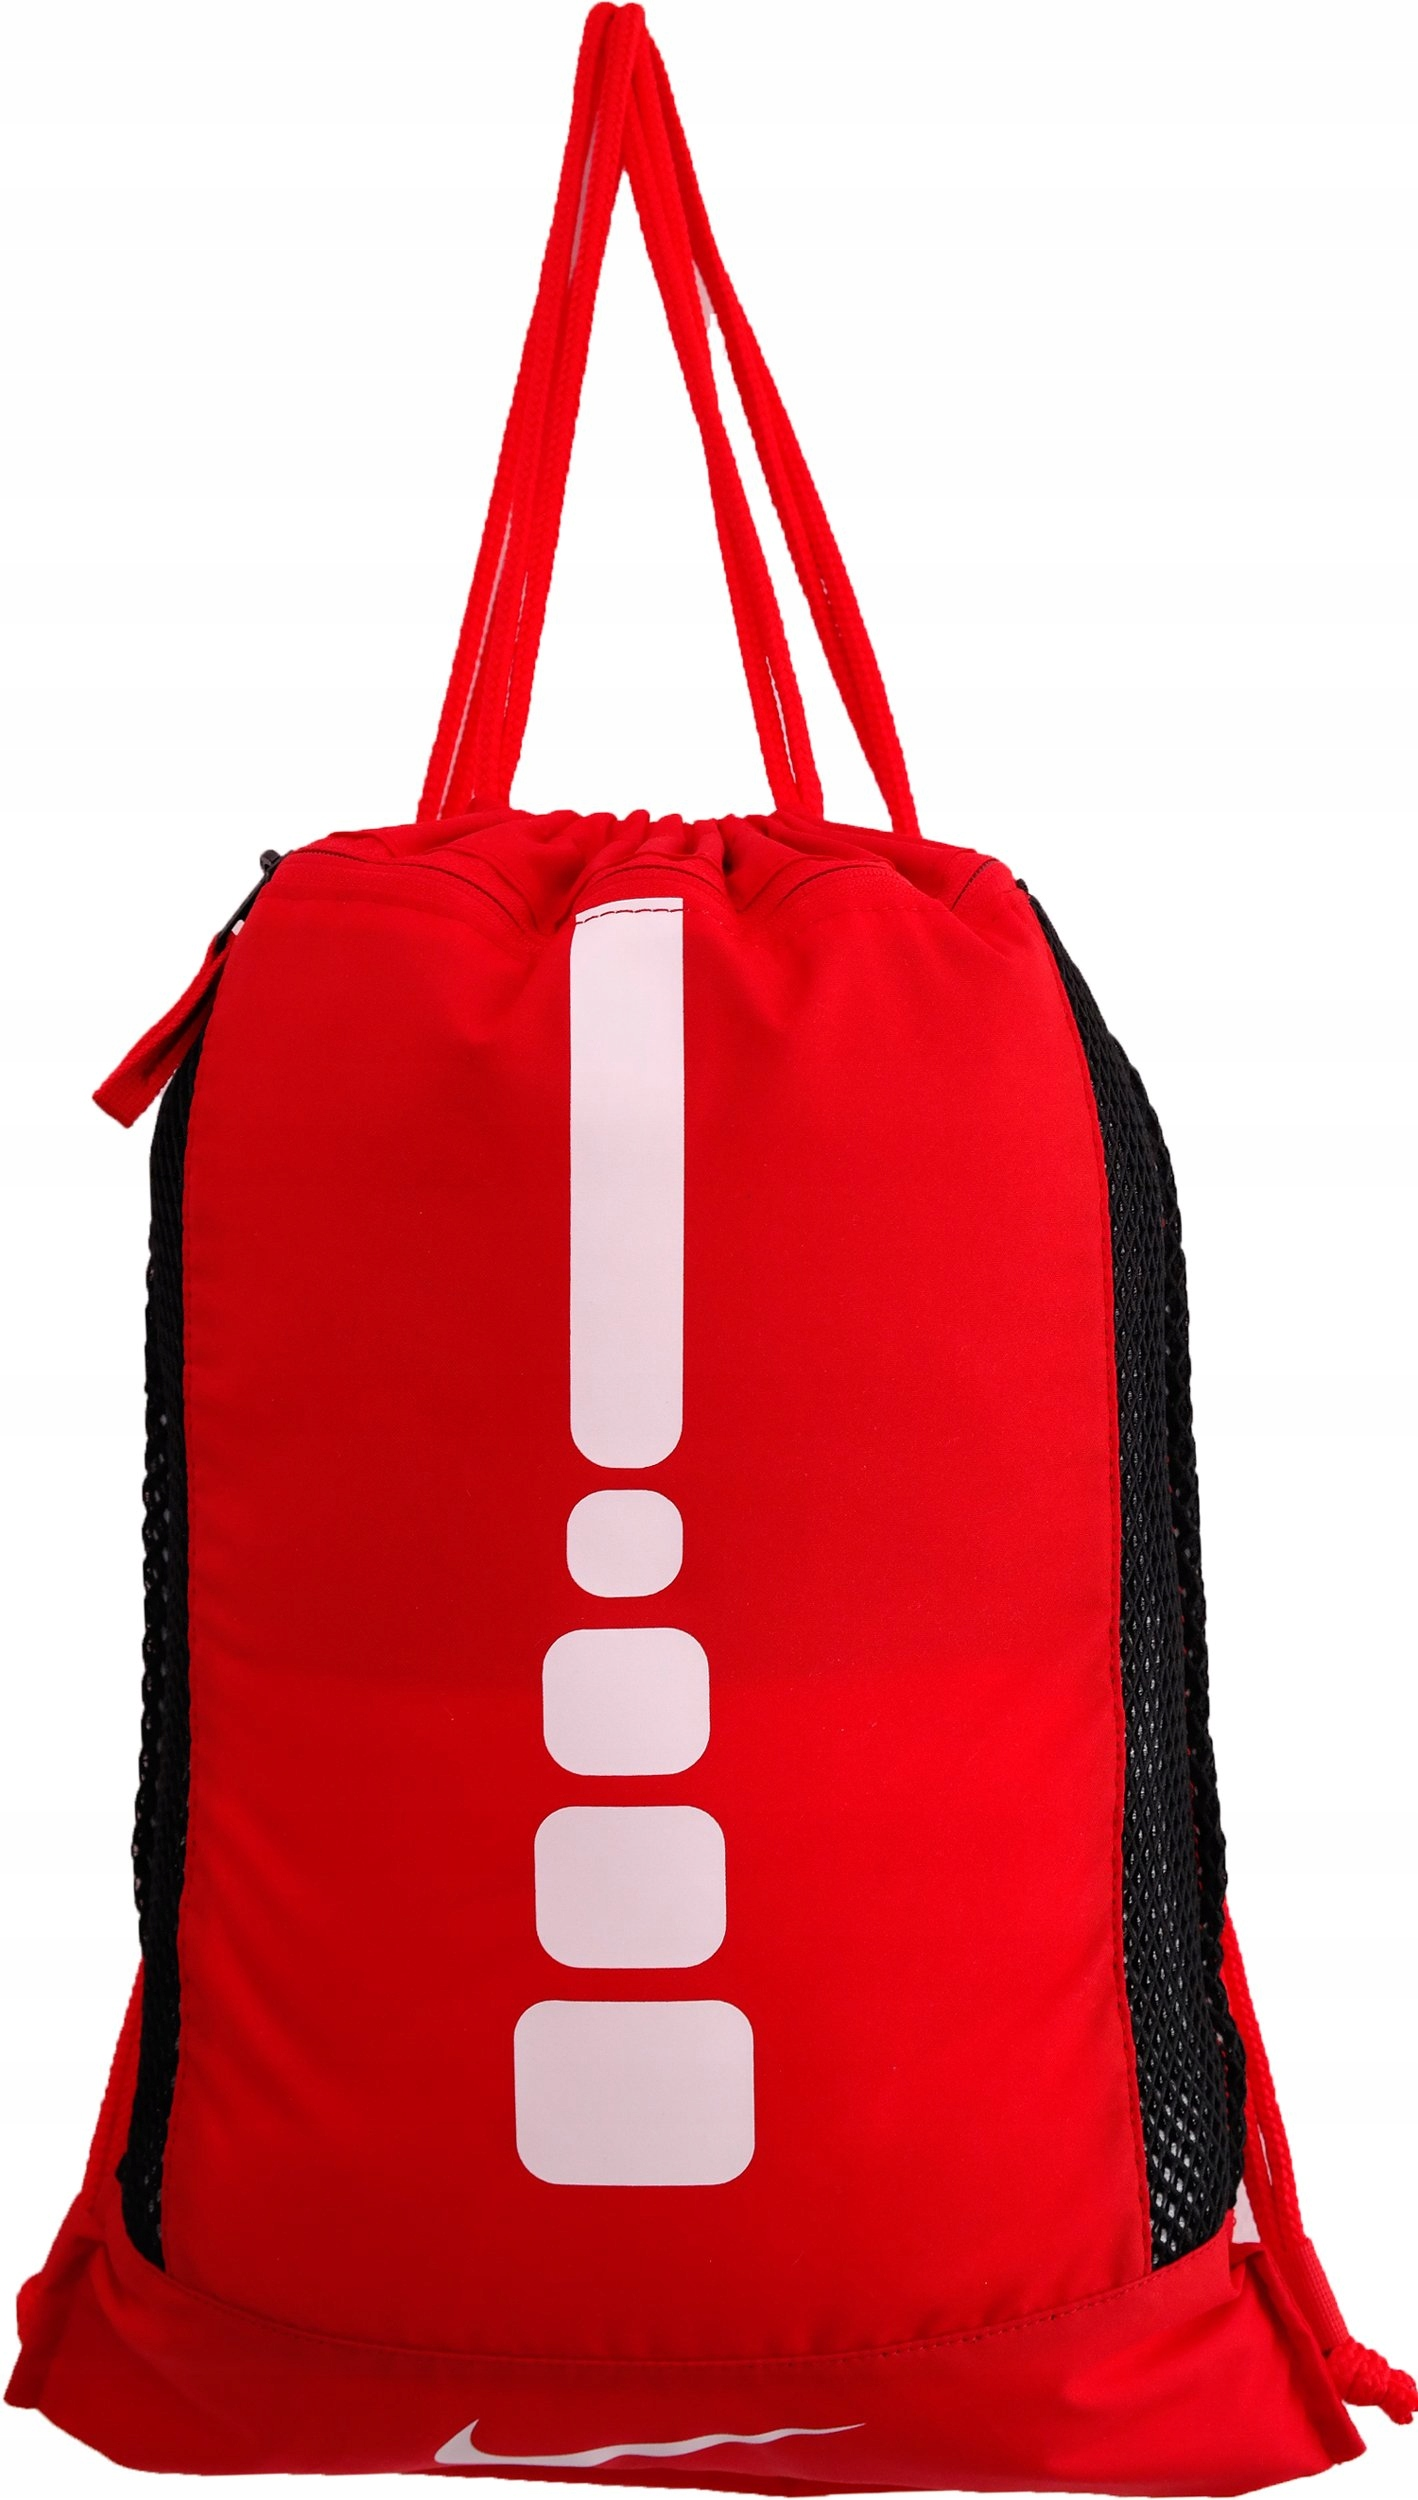 c8fa5e2404c63 NIKE SOLIDNY worek plecak torba trening szkoła - 6800674066 ...